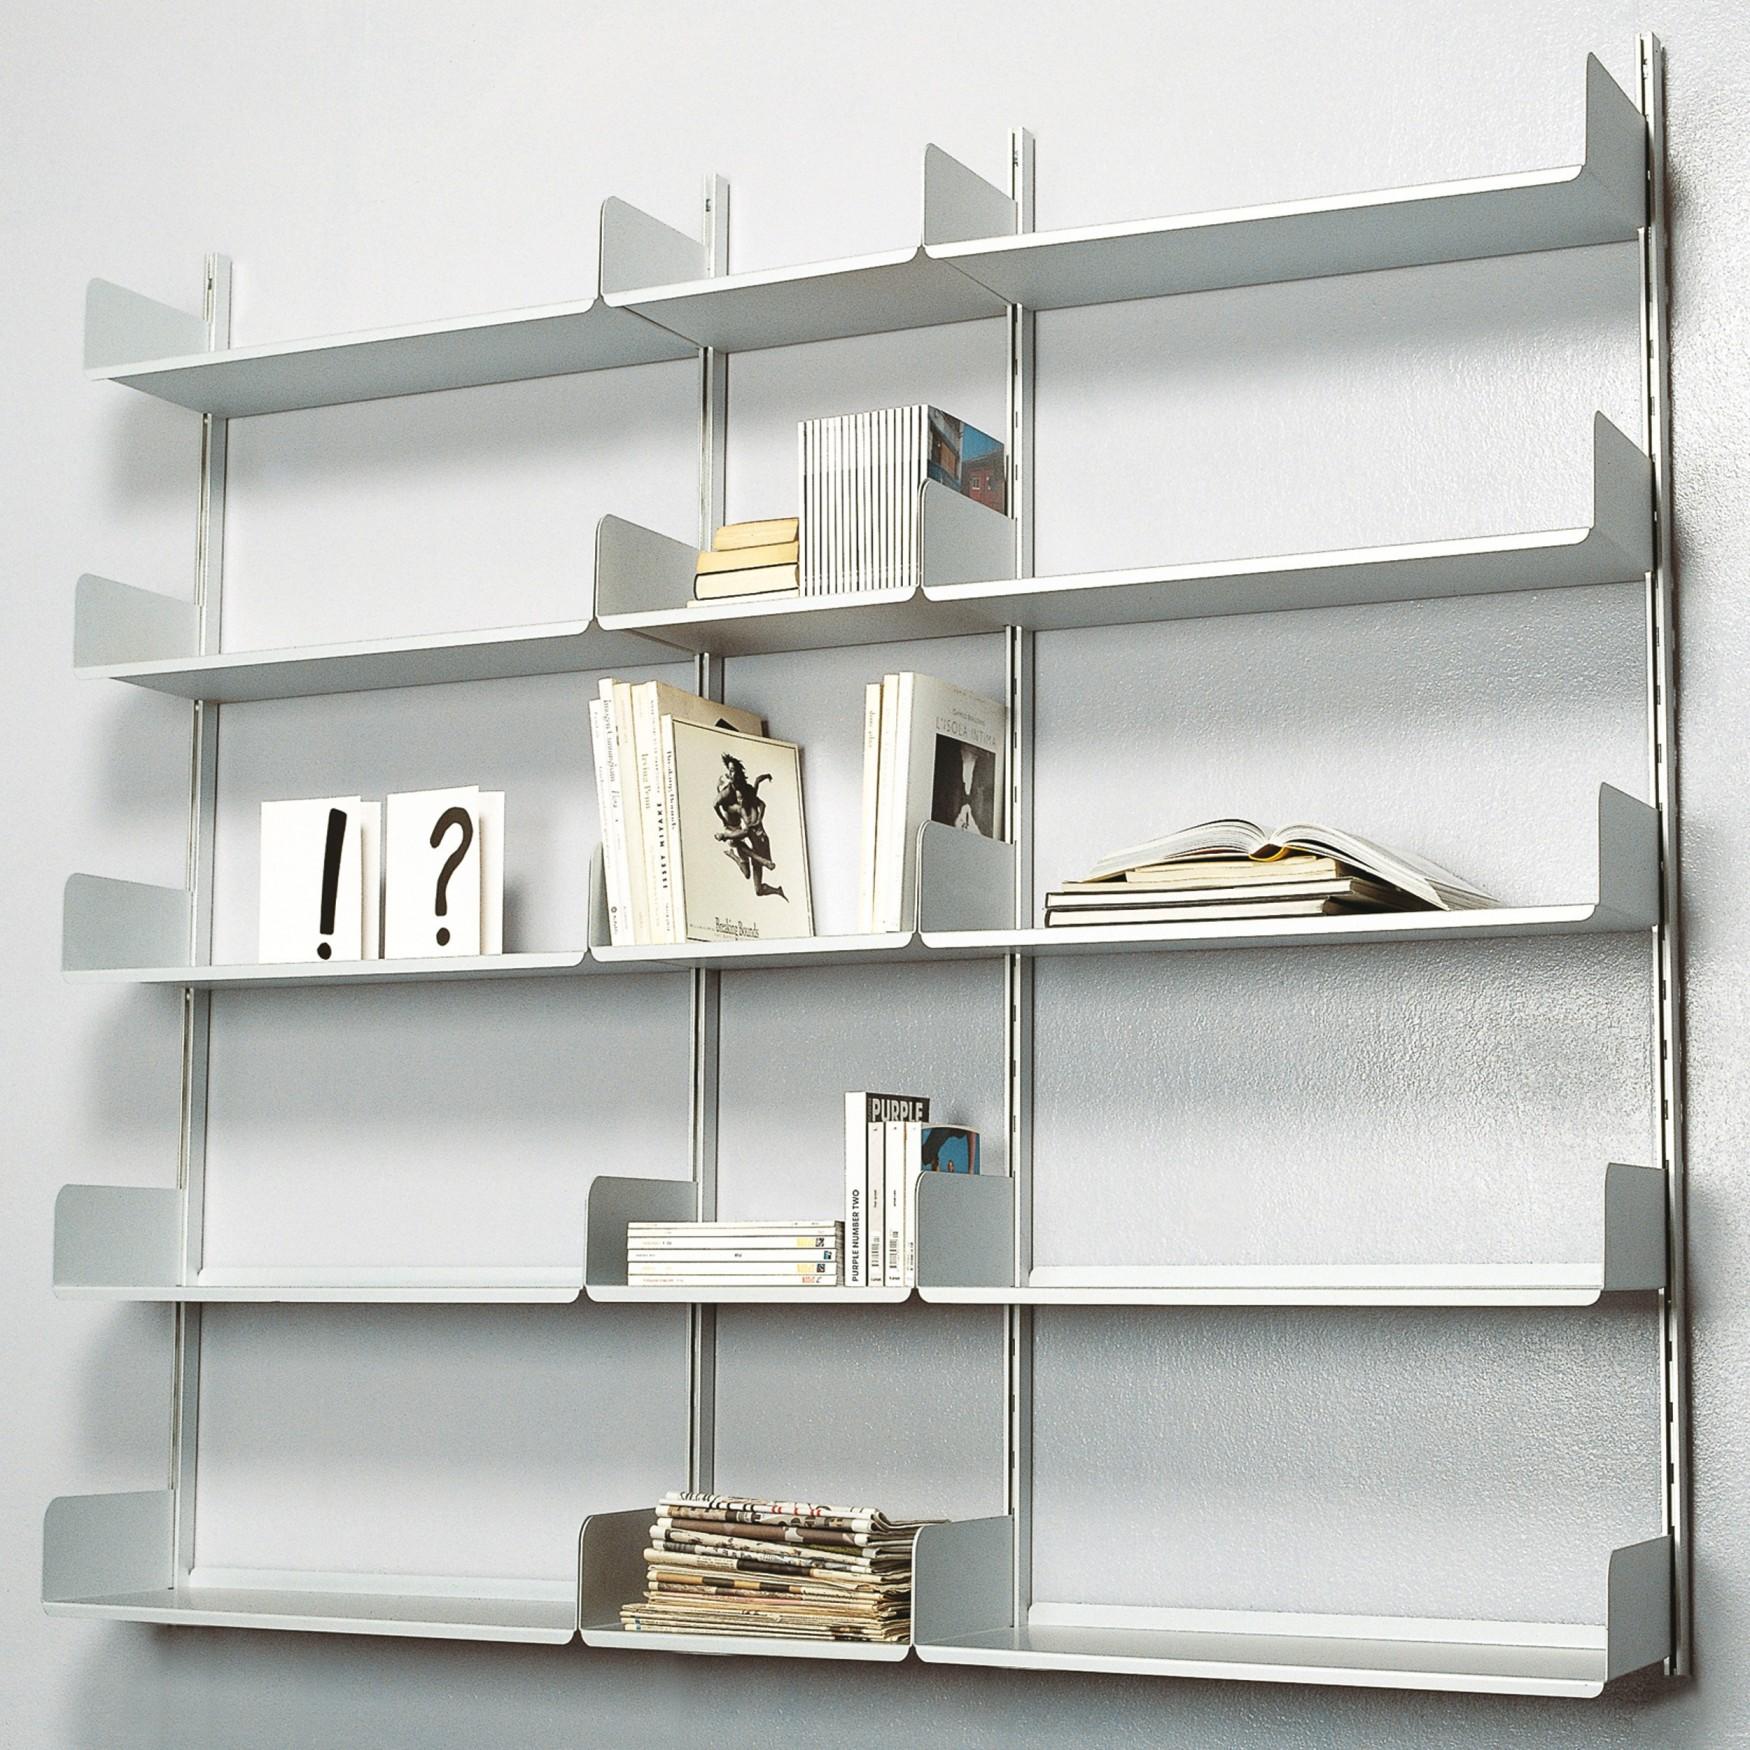 Librerie Metallo Milano.Libreria Componibile K1 Kriptonite Nikelshop Home Design